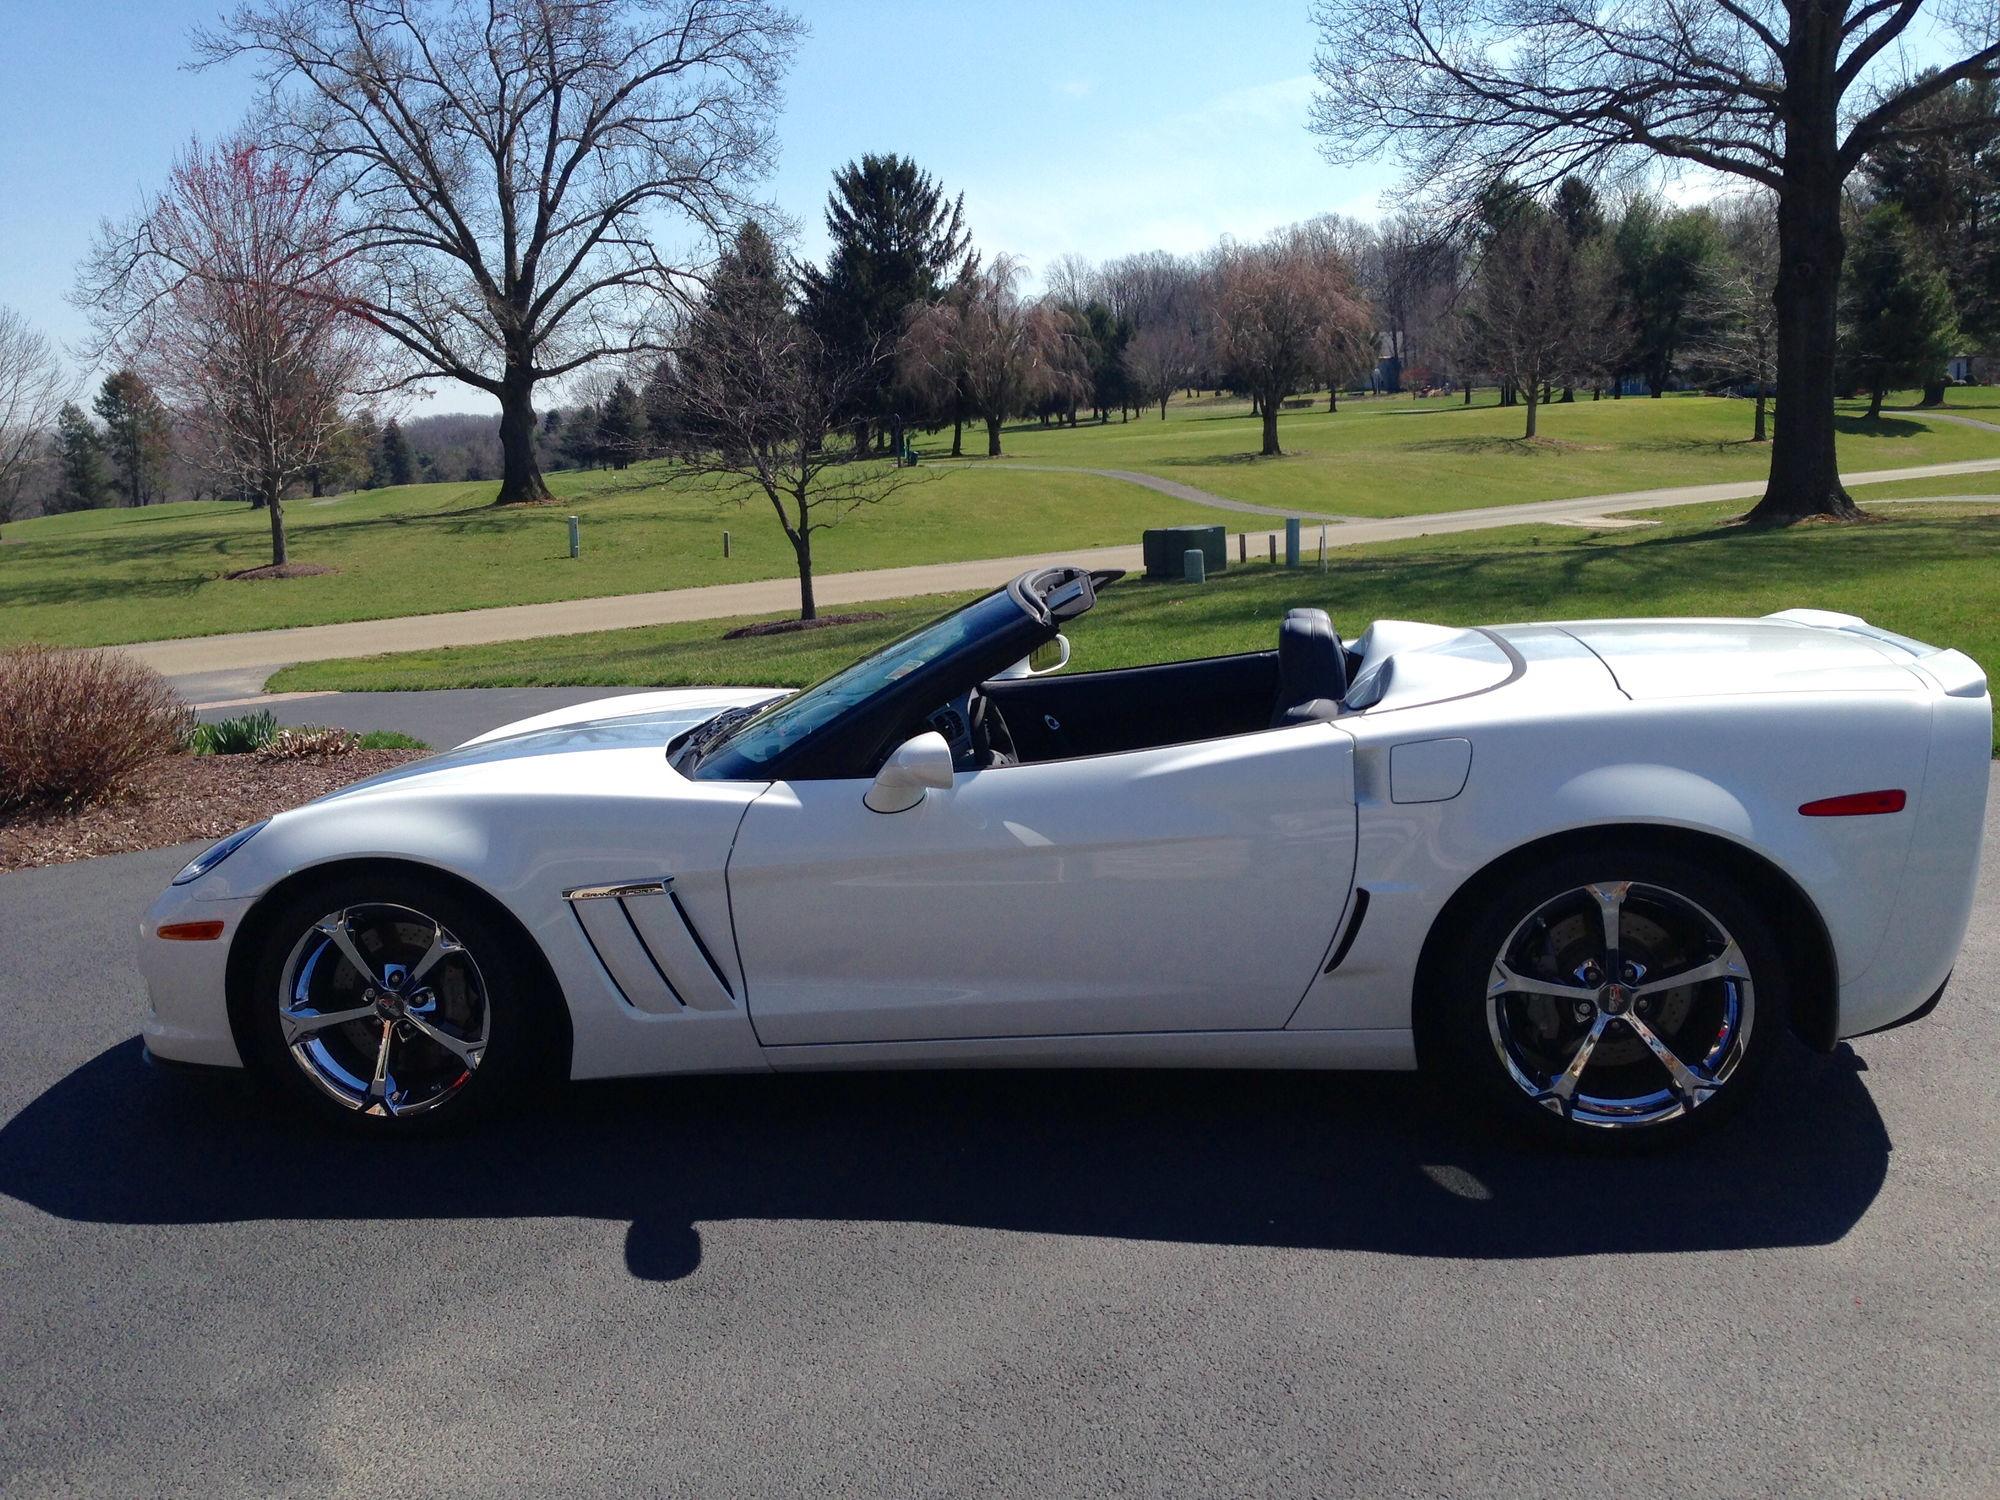 f s 2013 60th anniversary grand sport convertible 4lt 6spd 9600 miles corvetteforum. Black Bedroom Furniture Sets. Home Design Ideas